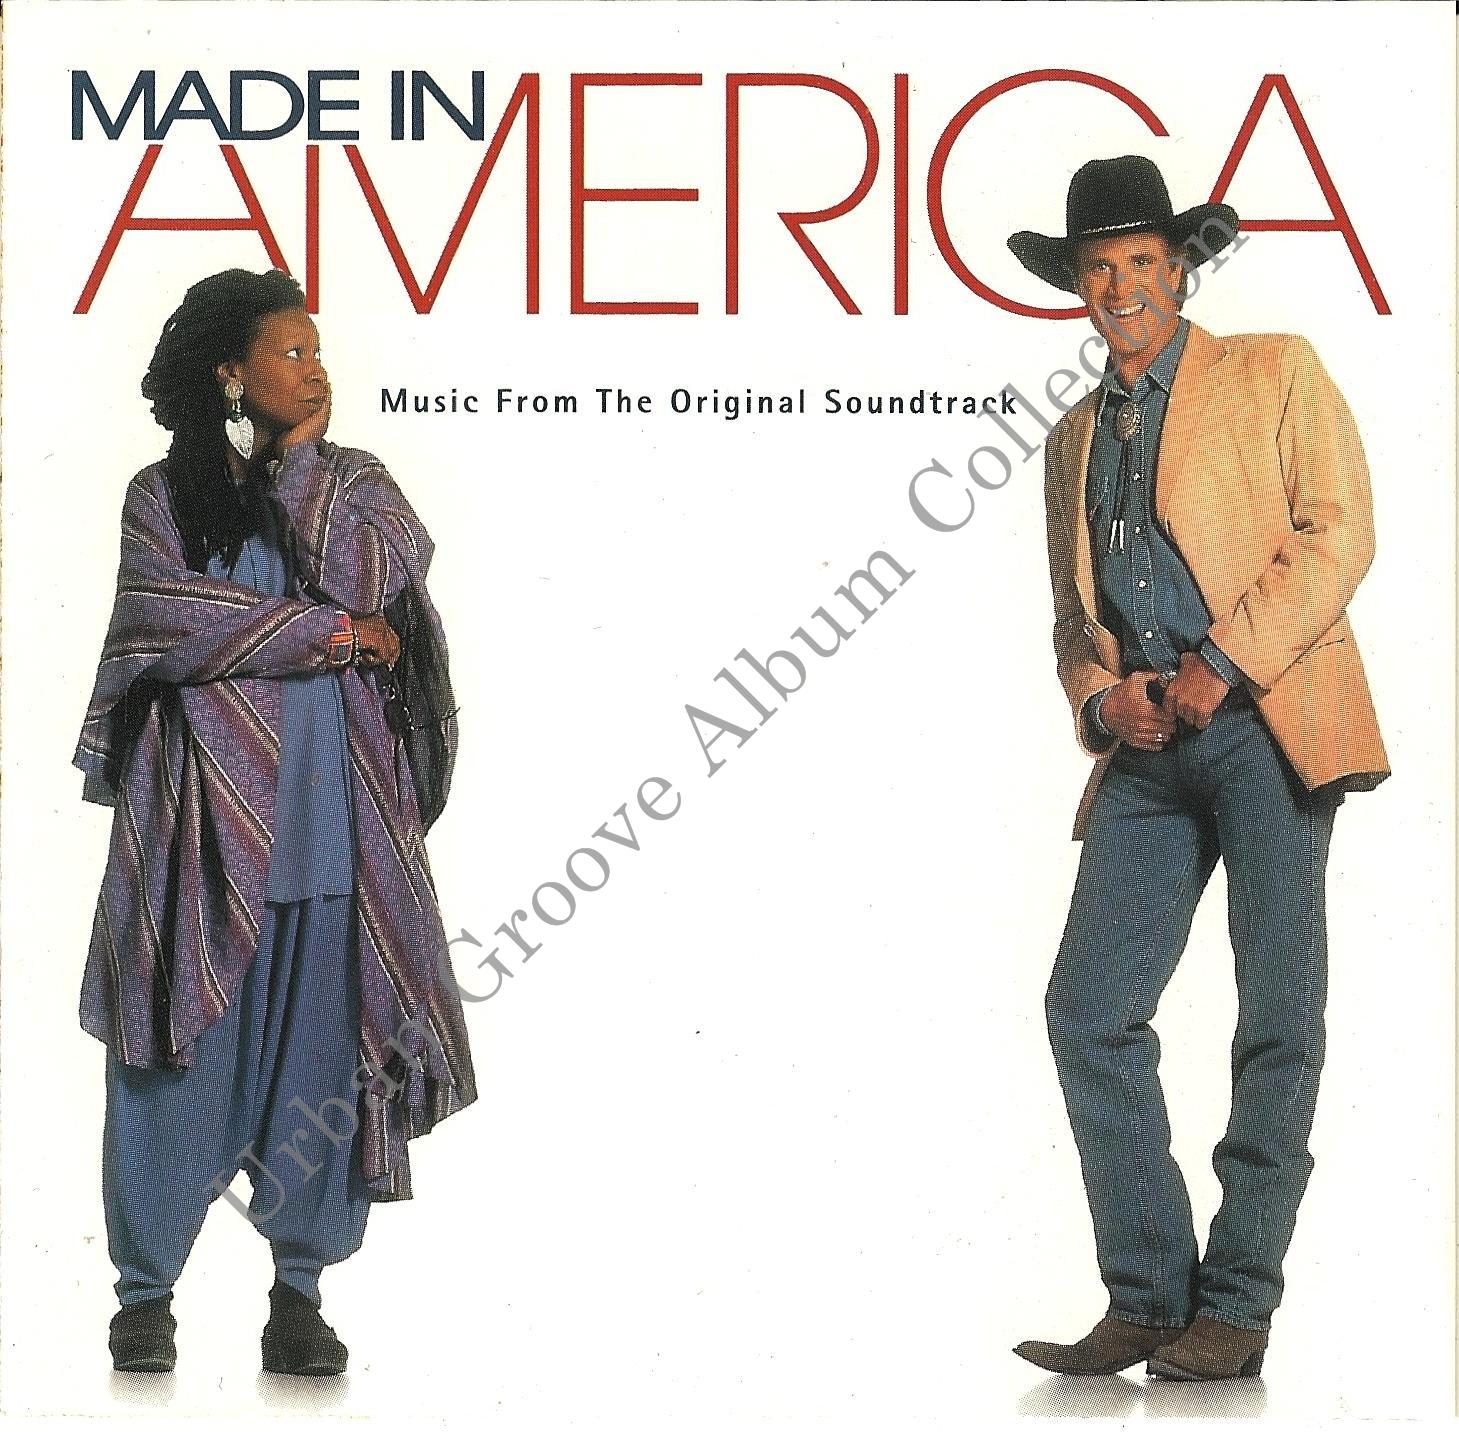 made in america 1993 - photo #3